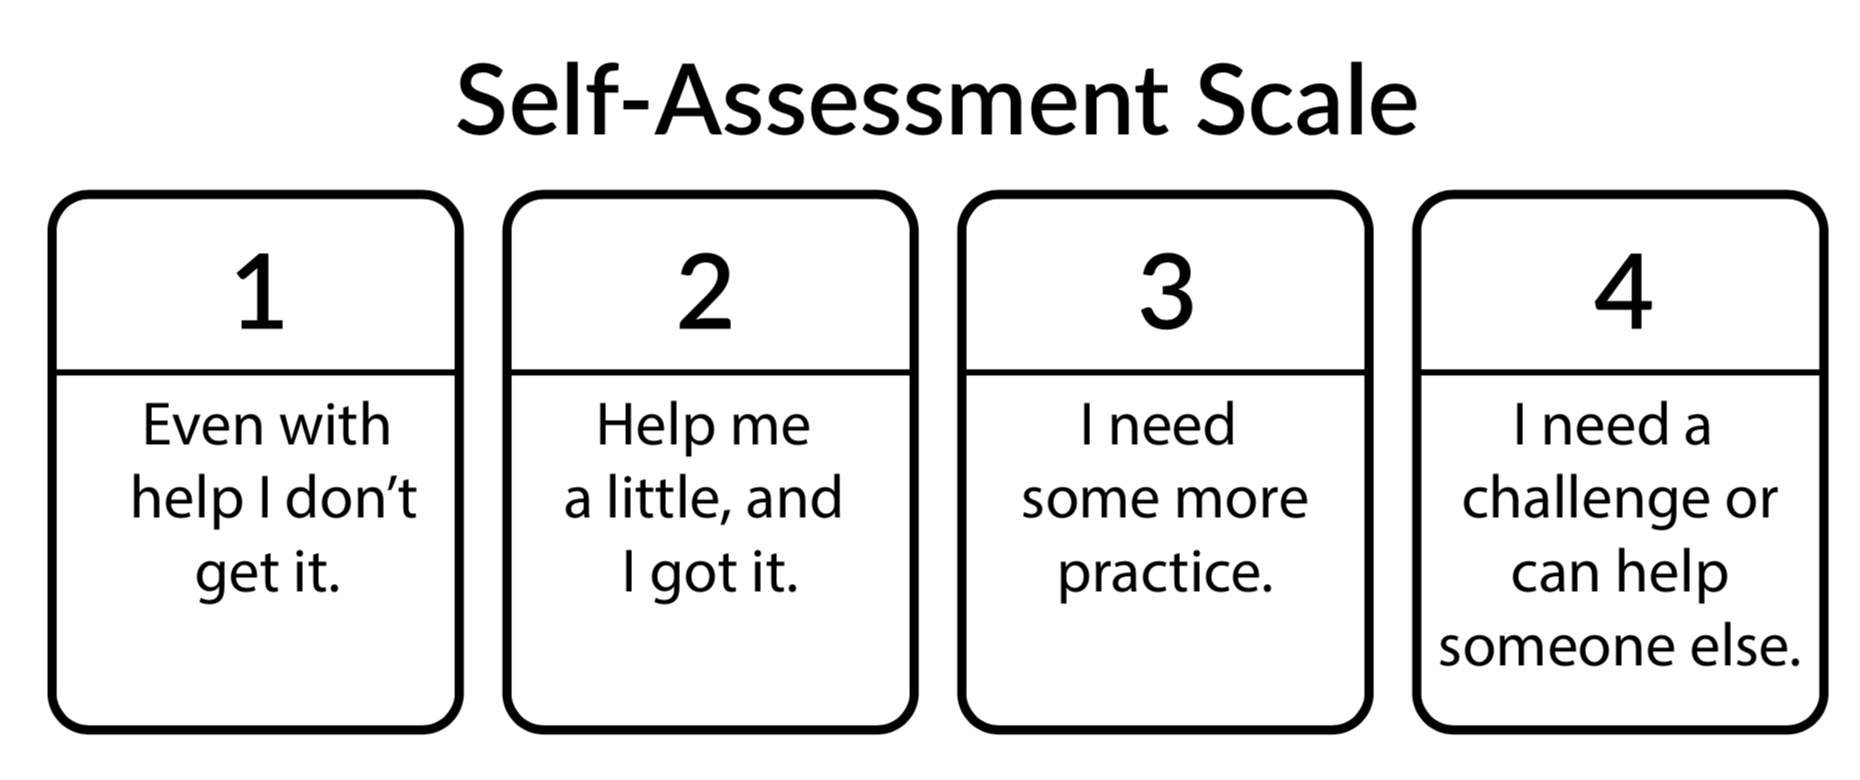 Printable Worksheets For Teachers (K-12) - Teachervision | Types Of Government Worksheets Printable